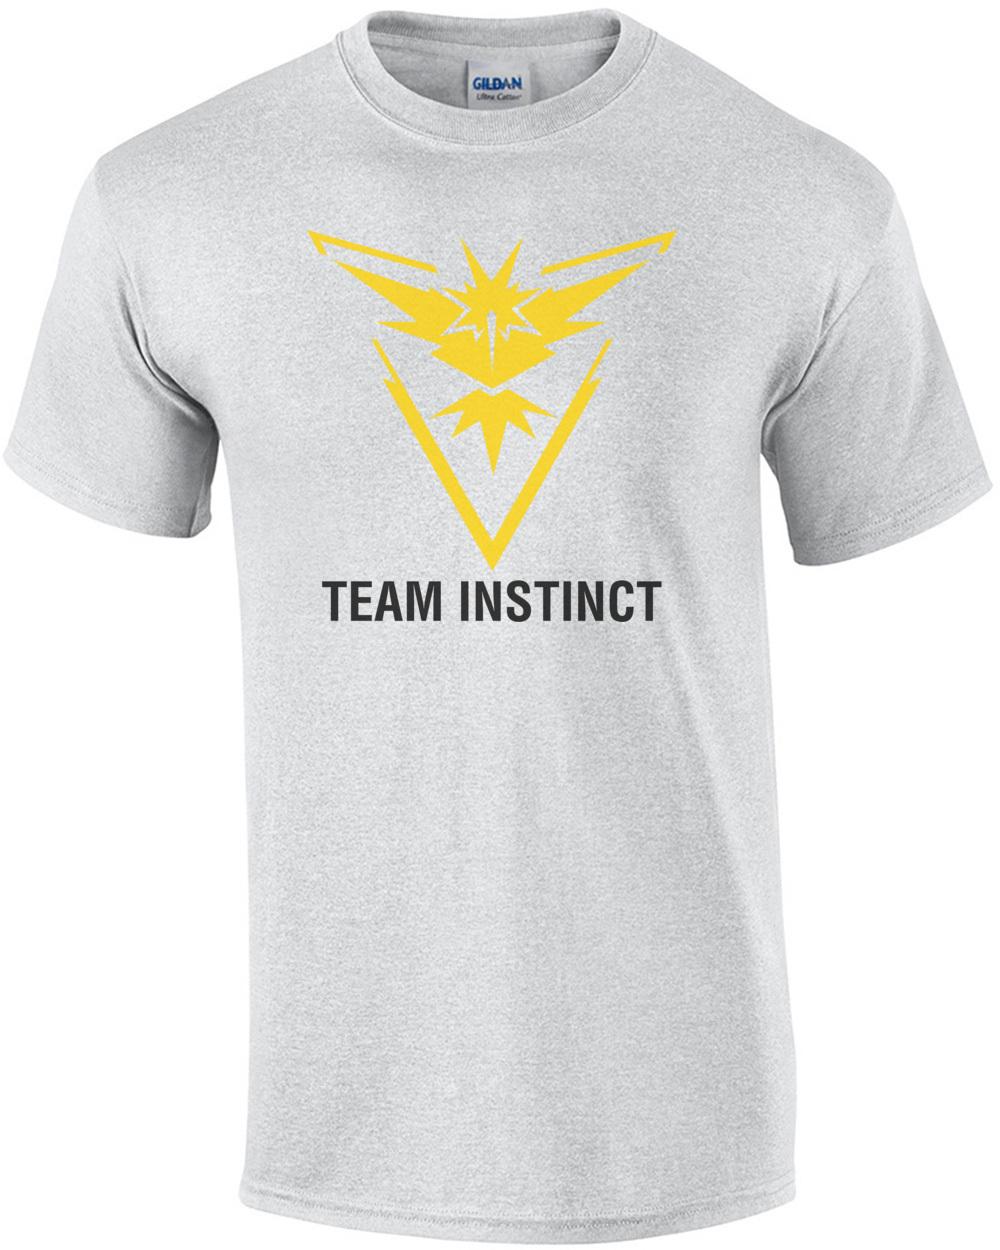 57f1c932a Pokemon Go Team Instinct Shirt